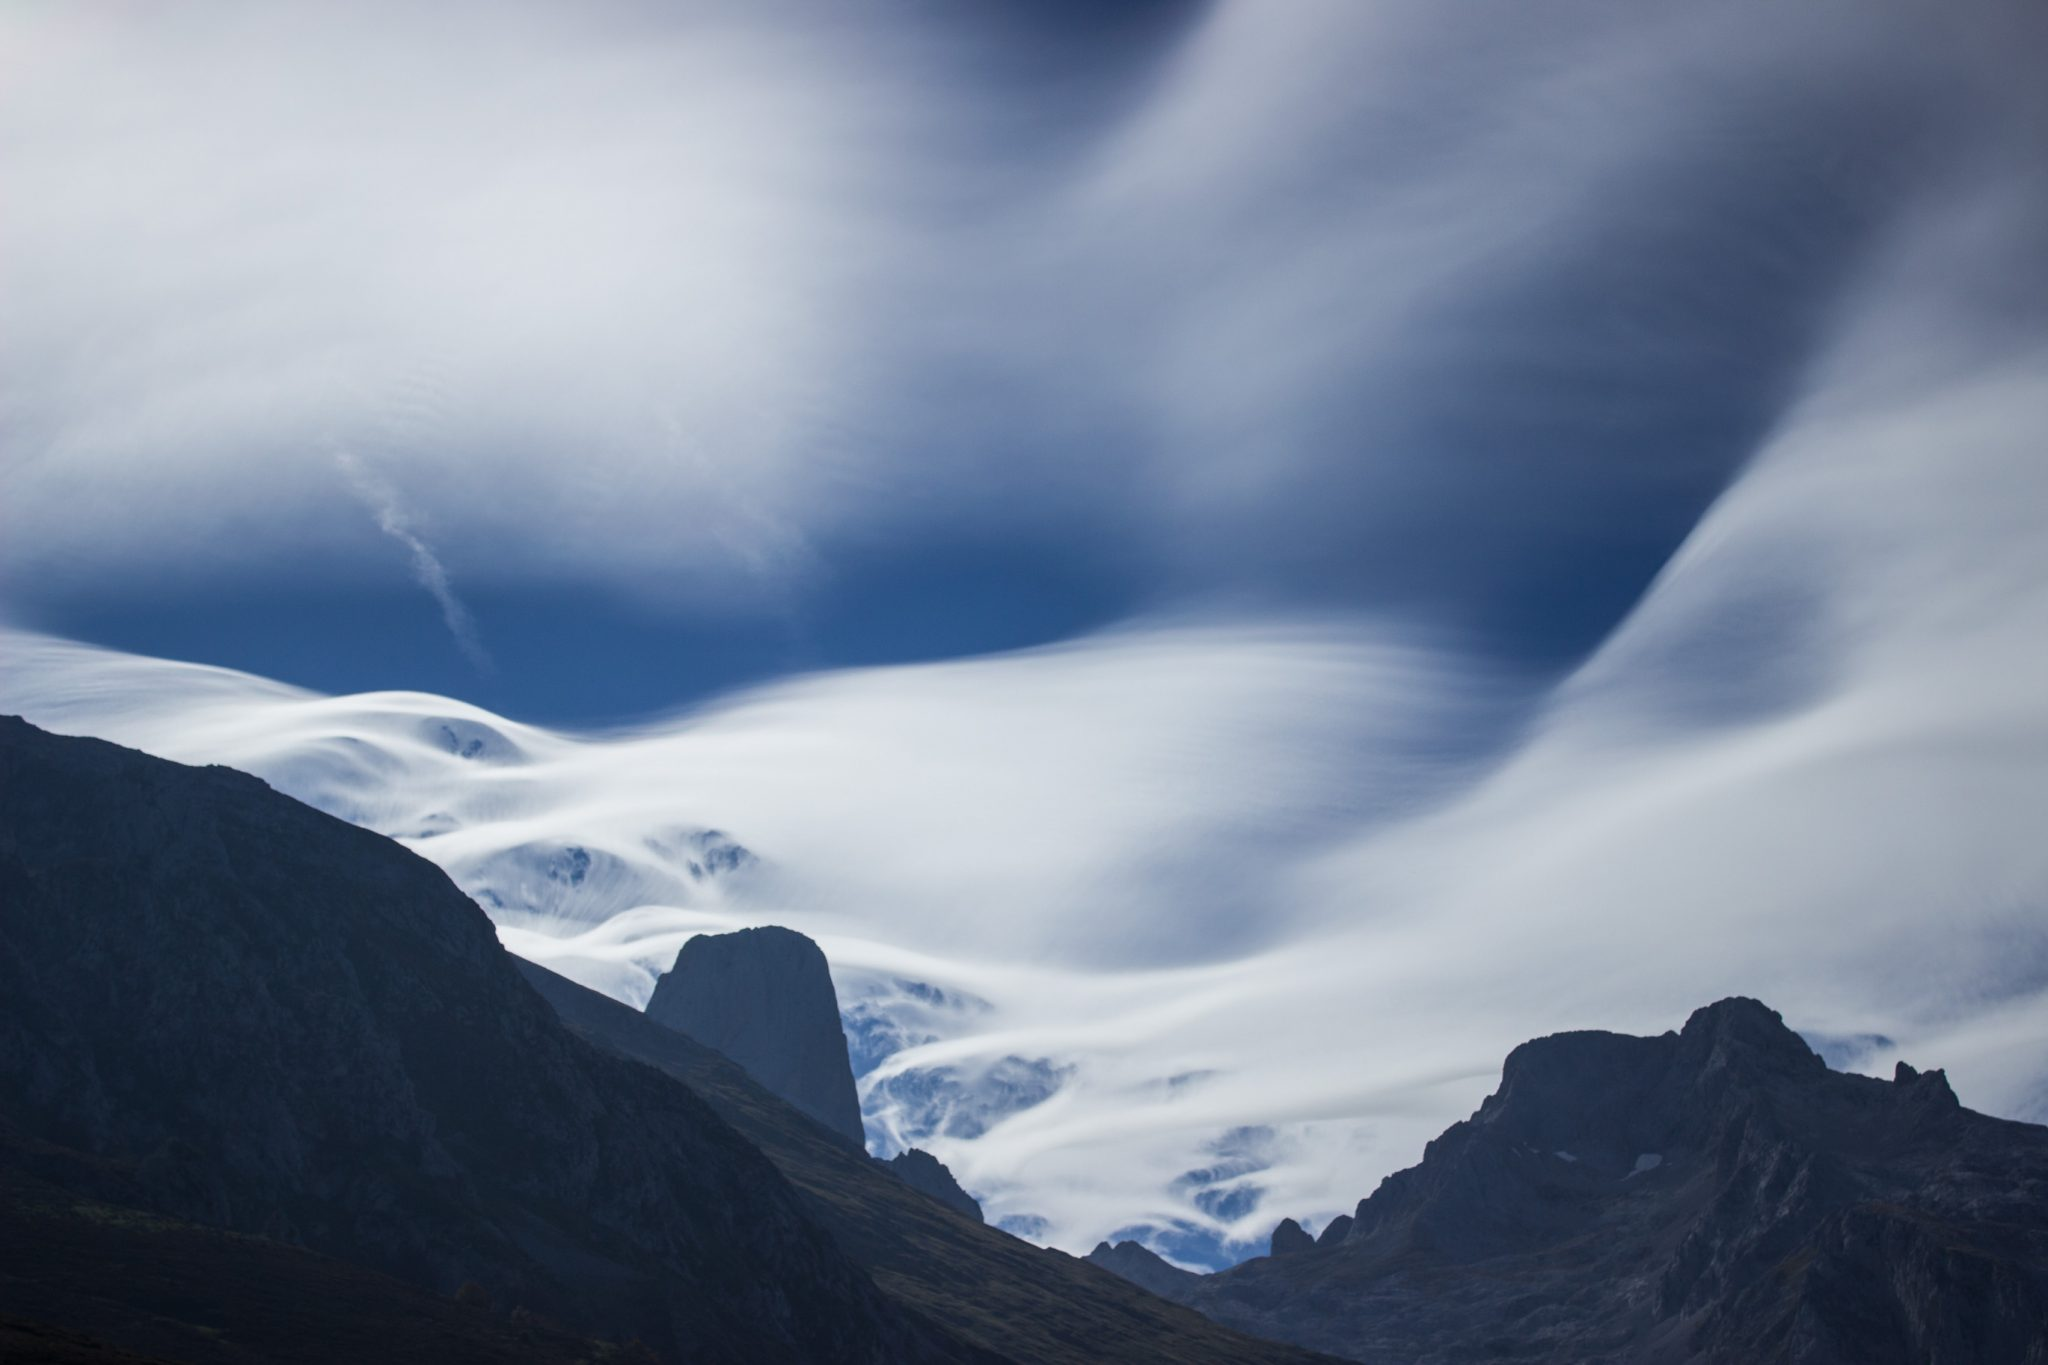 Wanderung Poncebos nach Bulnes in den Picos de Europa, Ausblick auf Berg Naranjo de Bulnes, auch Picu Urriellu, bekanntester Berg in Picos de Europa, Wolken sehen schön aus